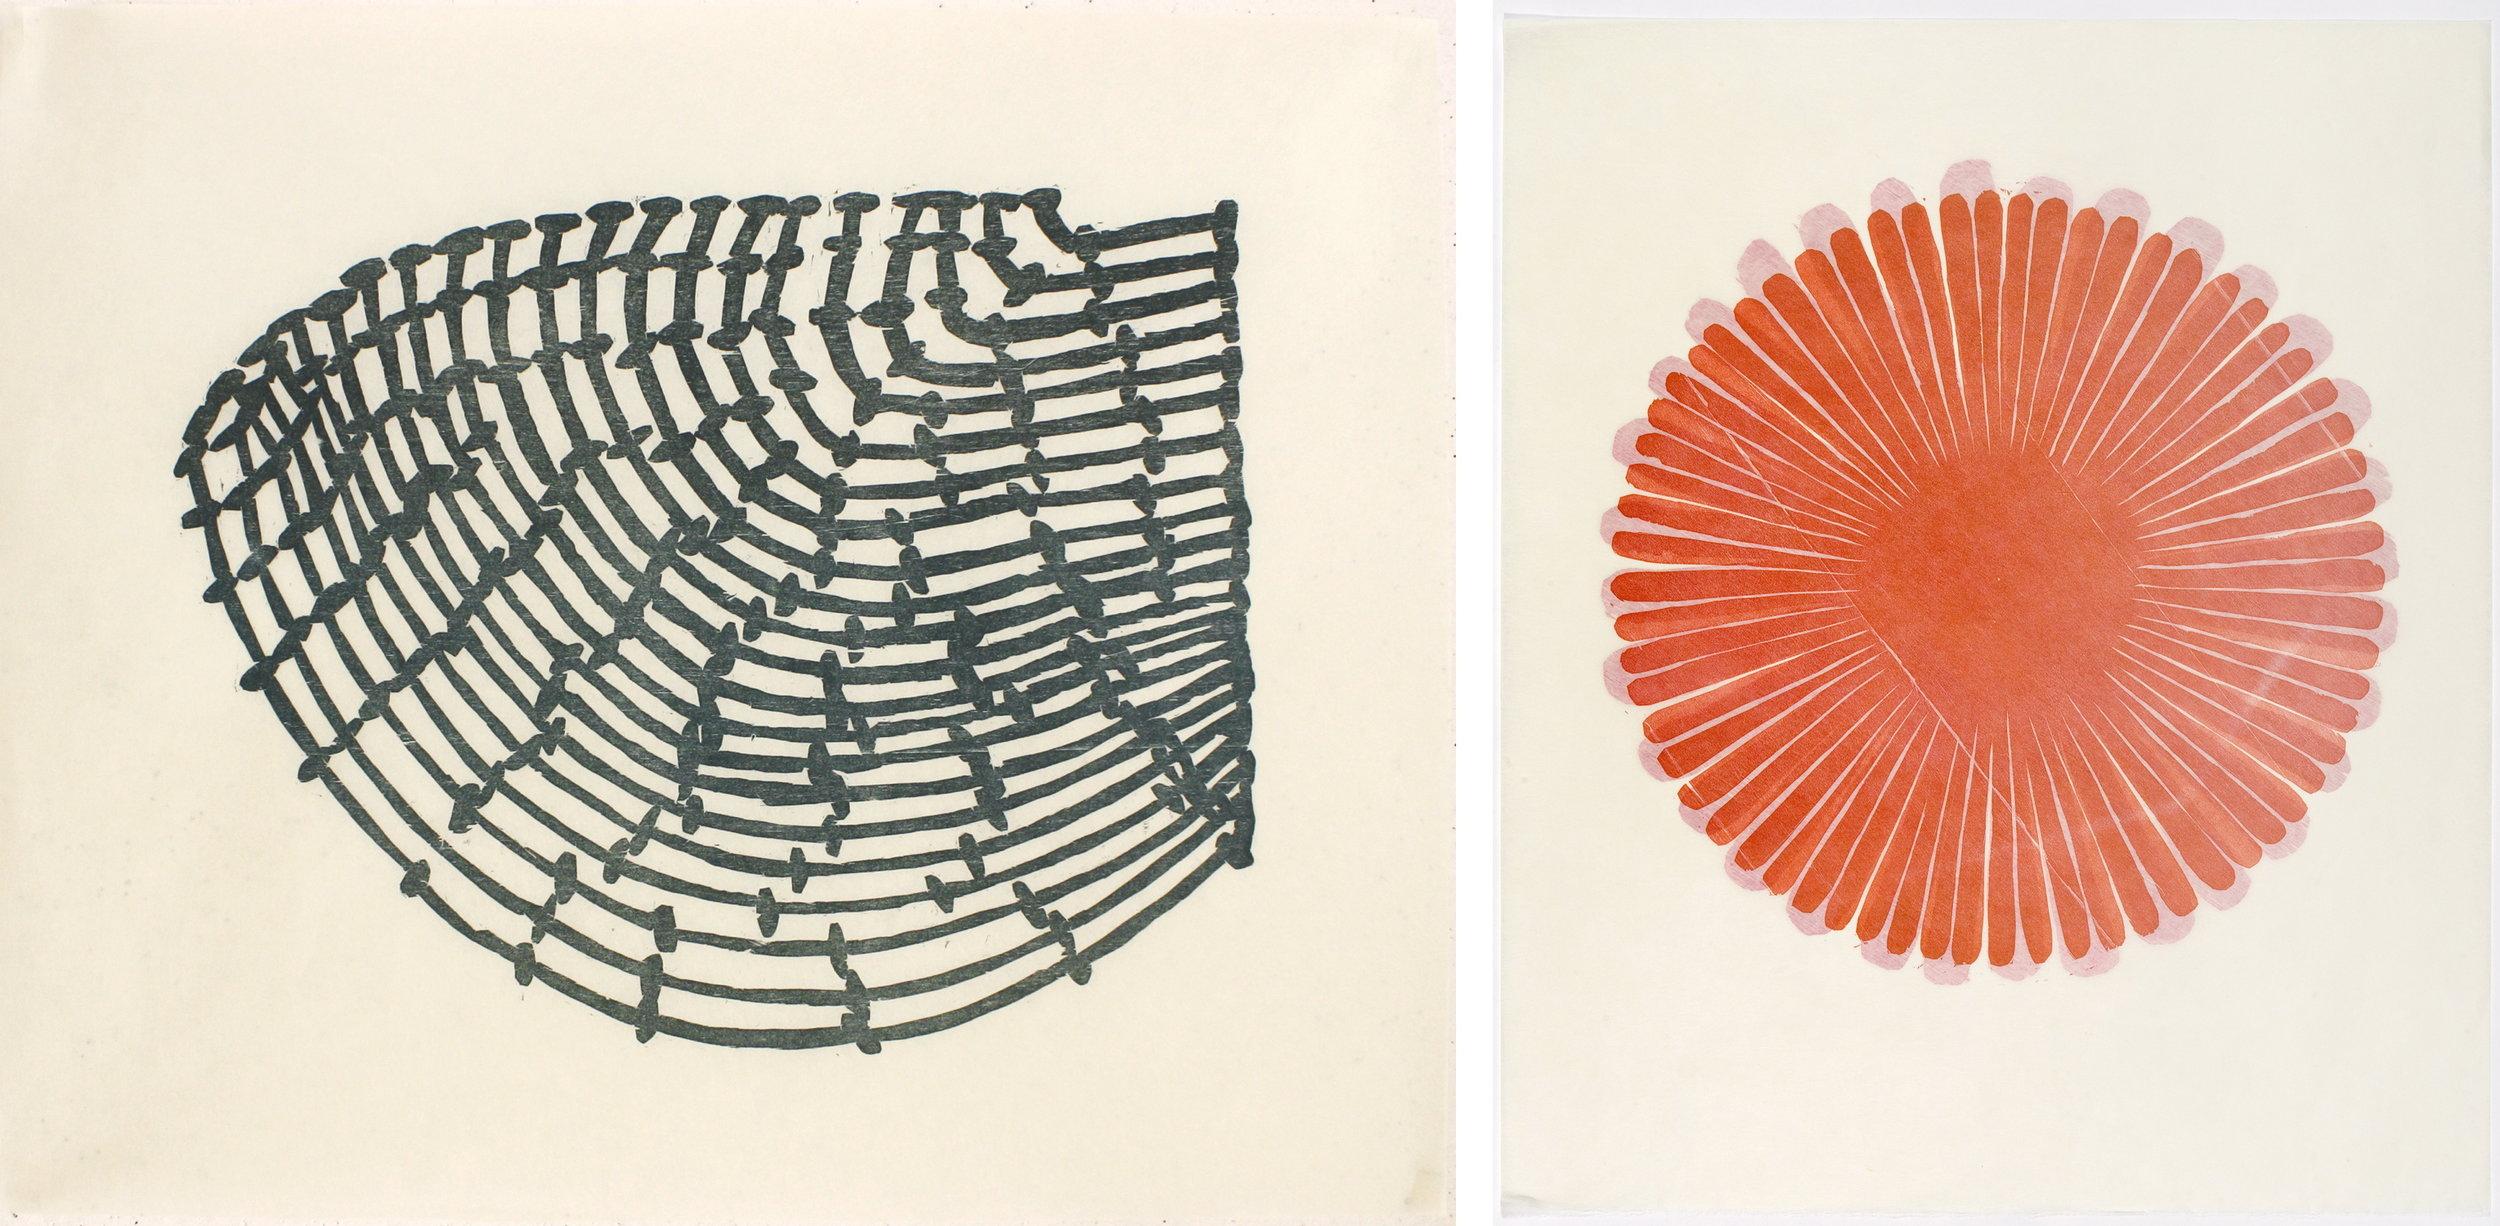 Anna Hepler Woodcut Prints